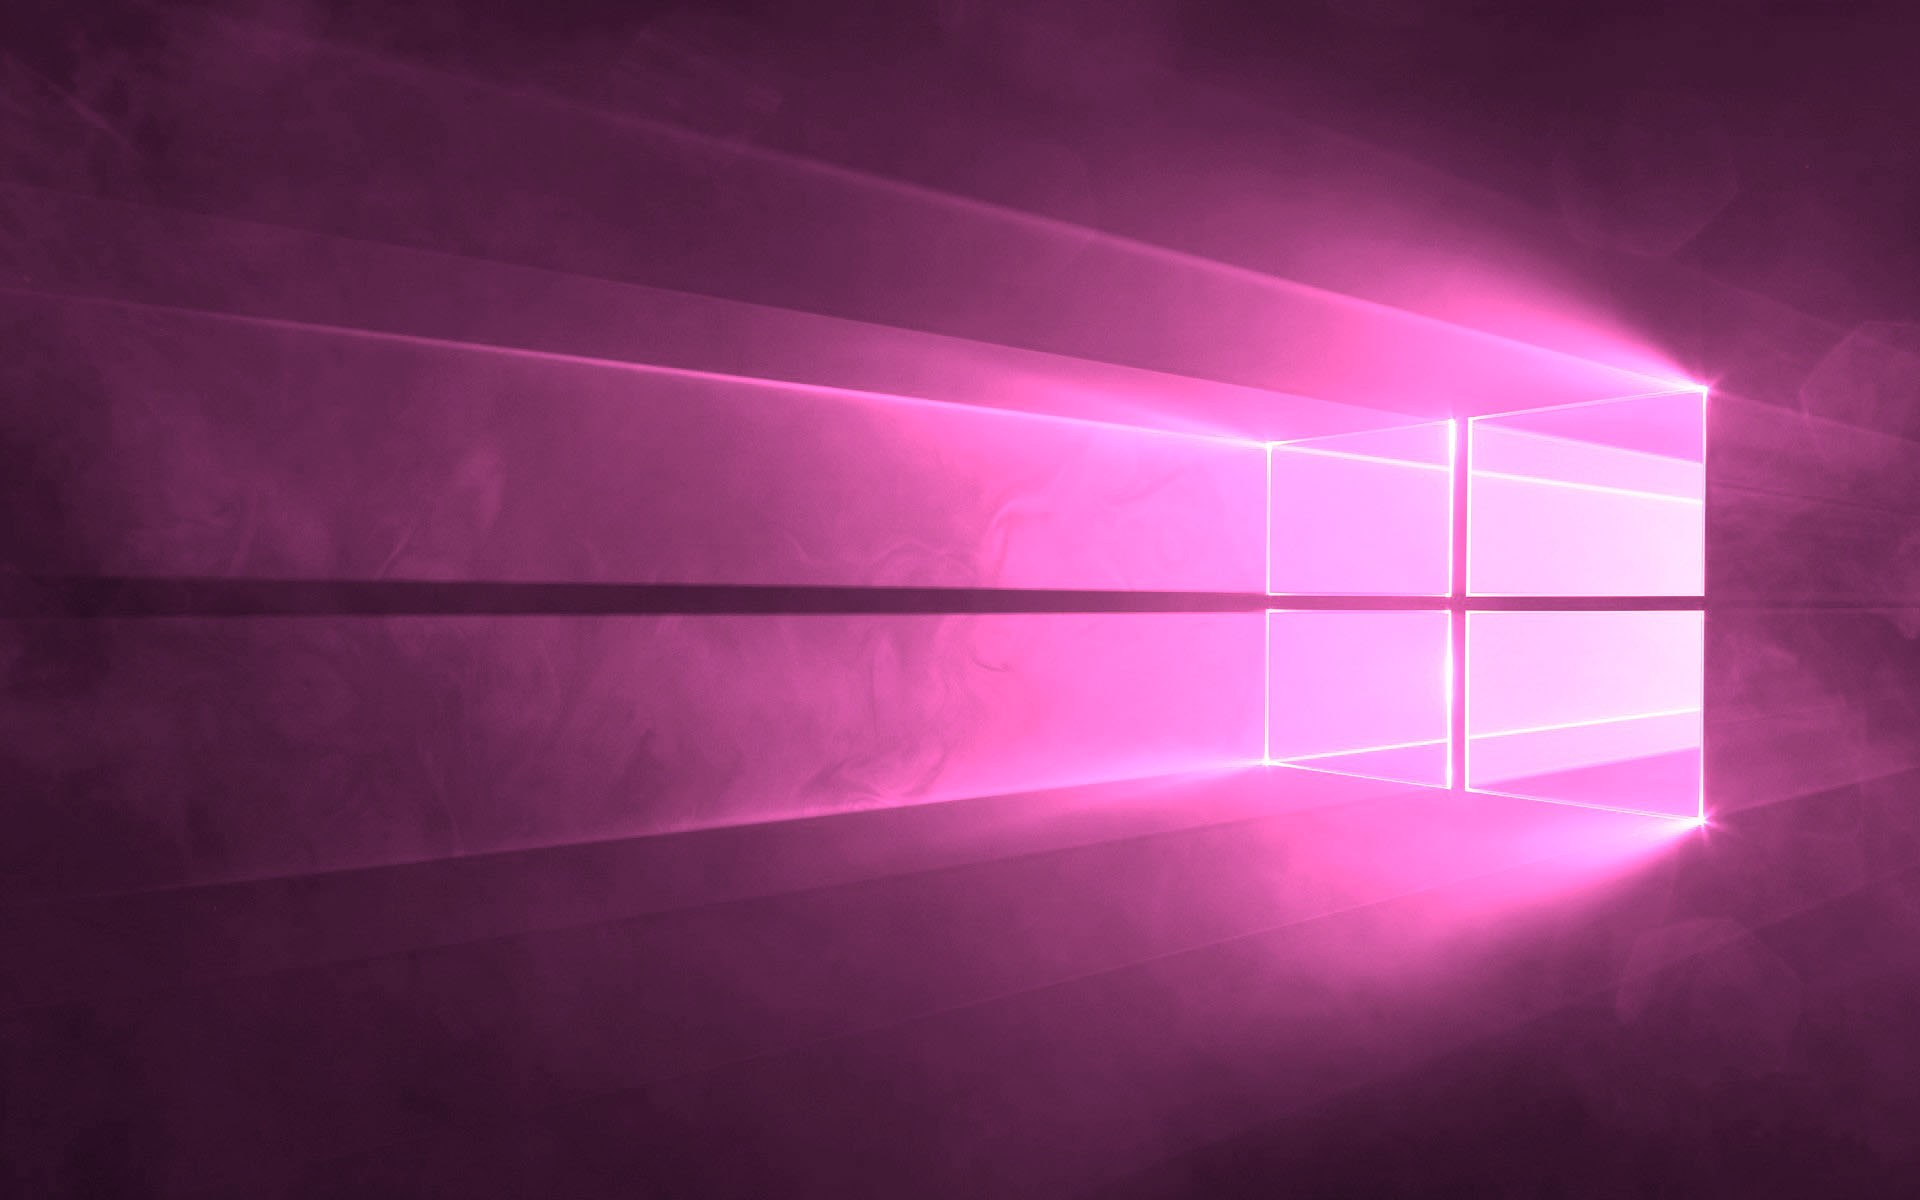 pink background windows 10 logo microsoft windows magenta window pink